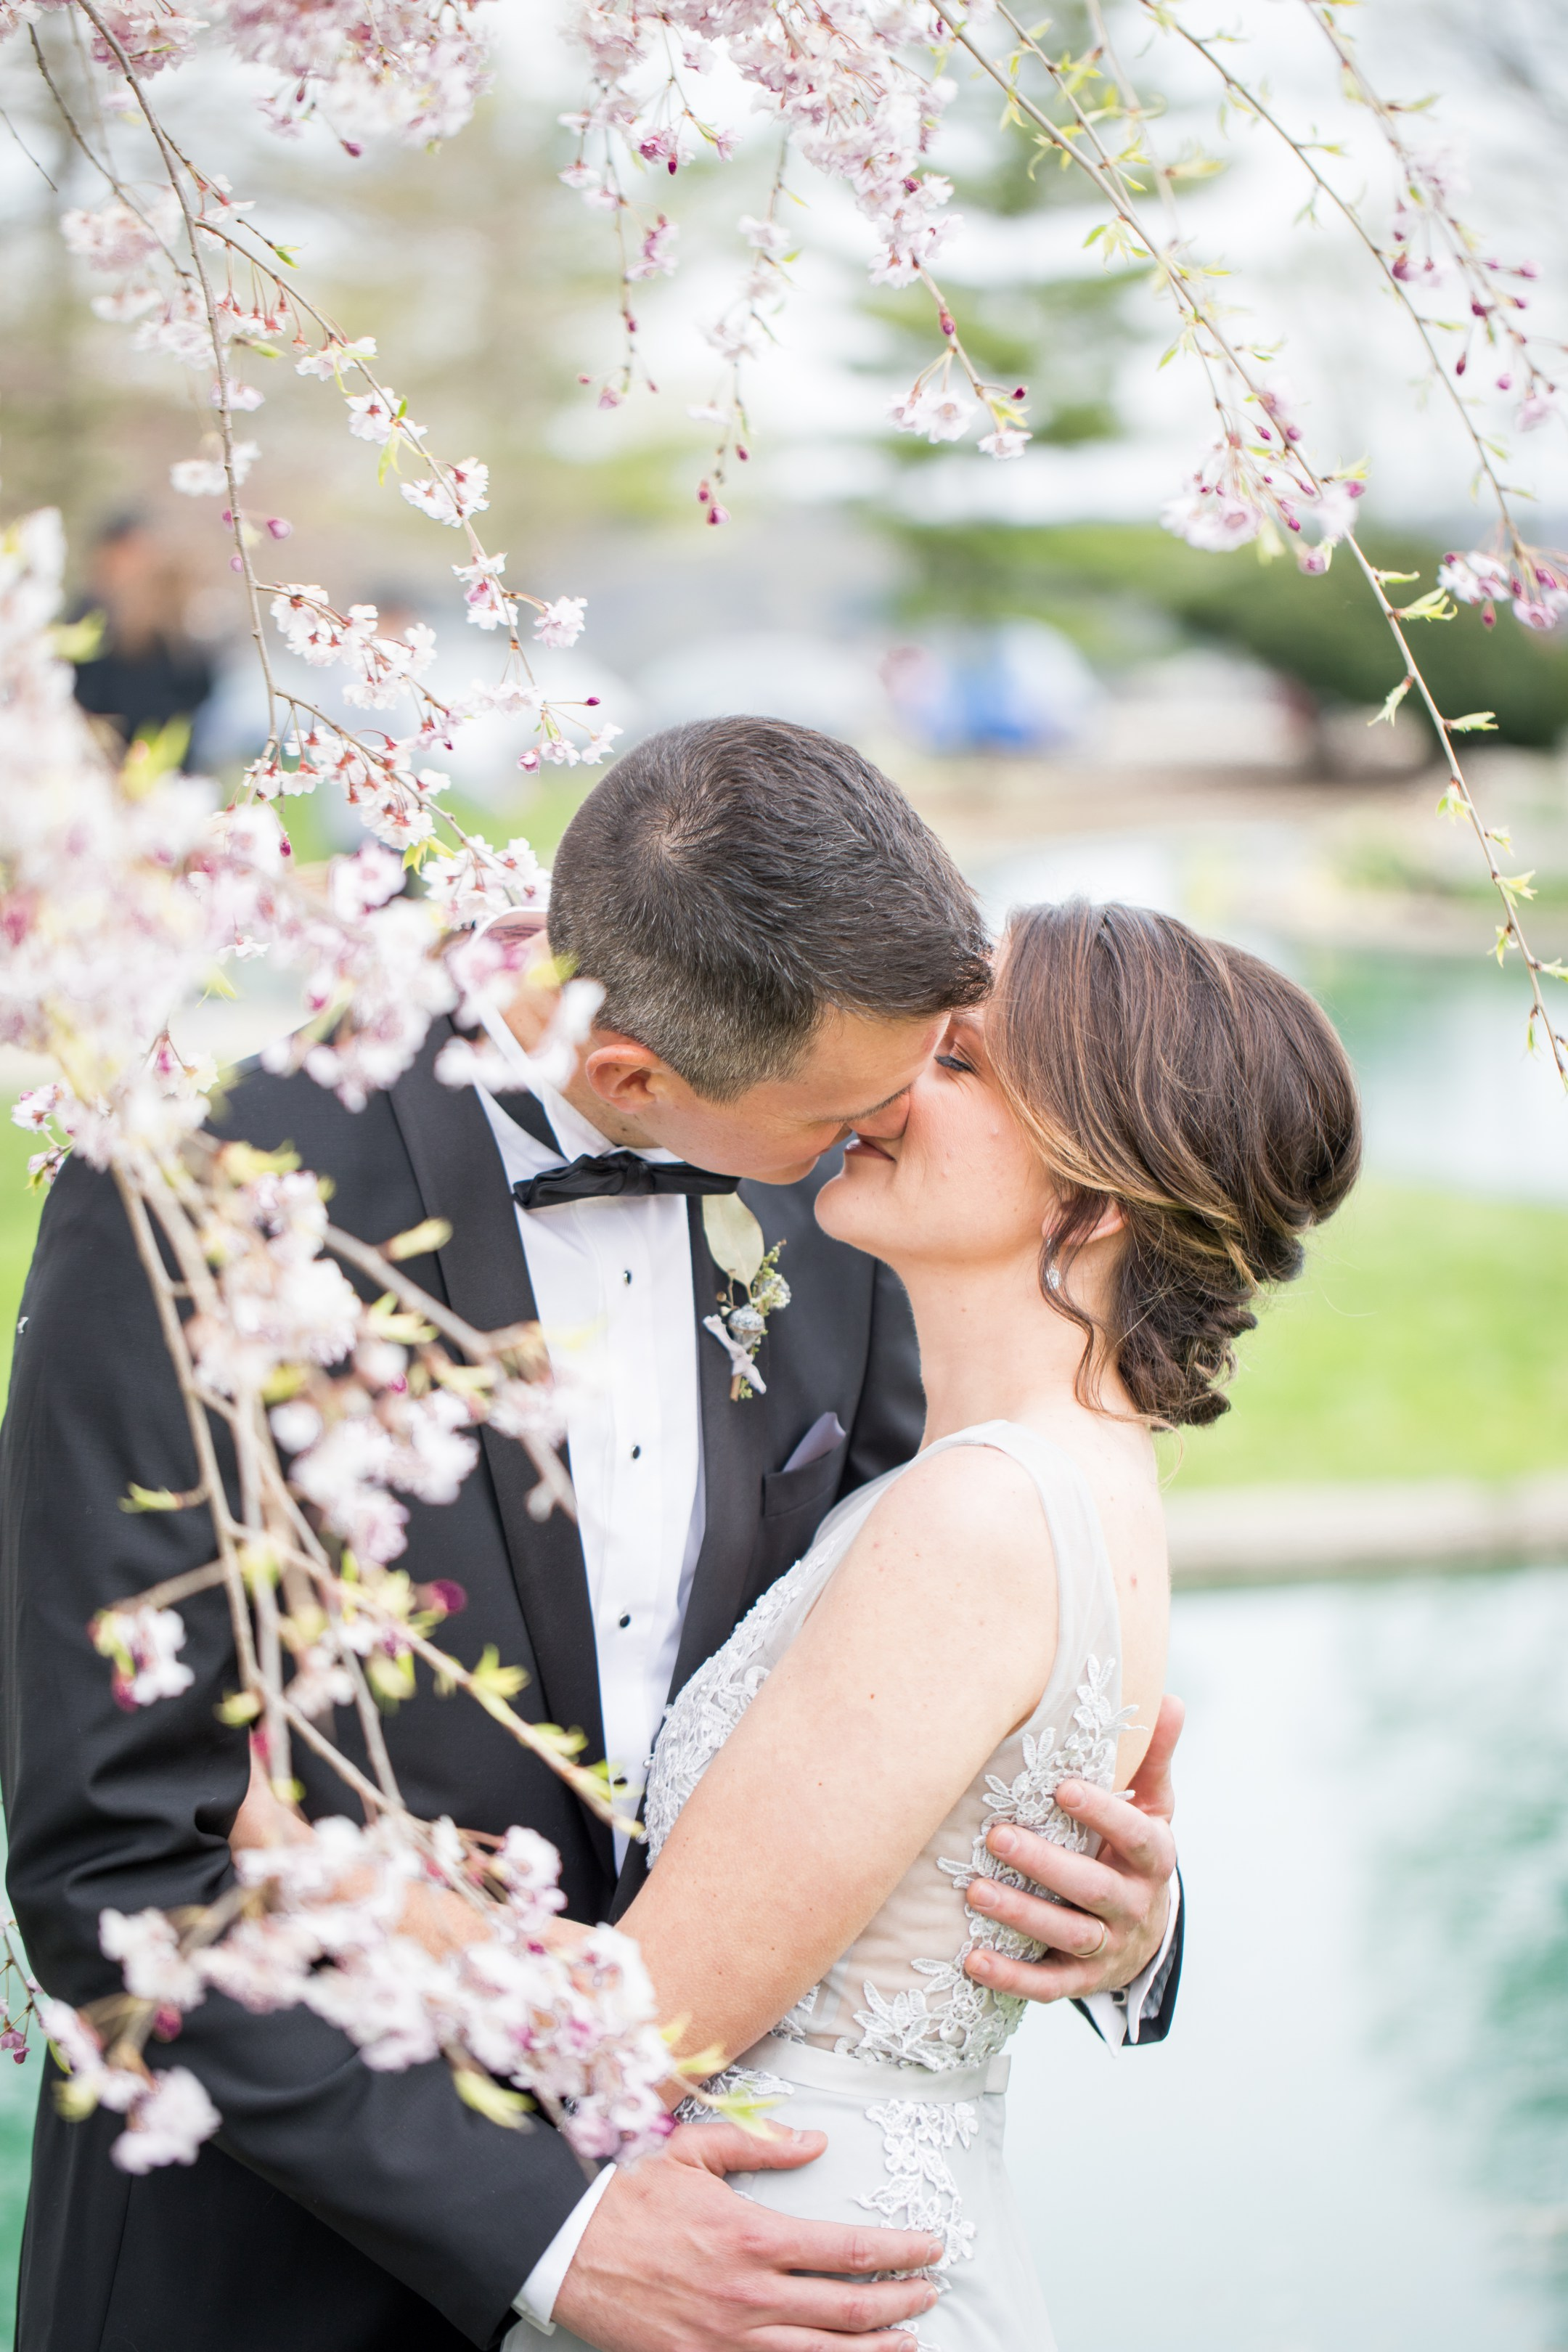 Eden Park, Cincinnati | Styled Shoot | Gray Wedding Dress Cincinnati